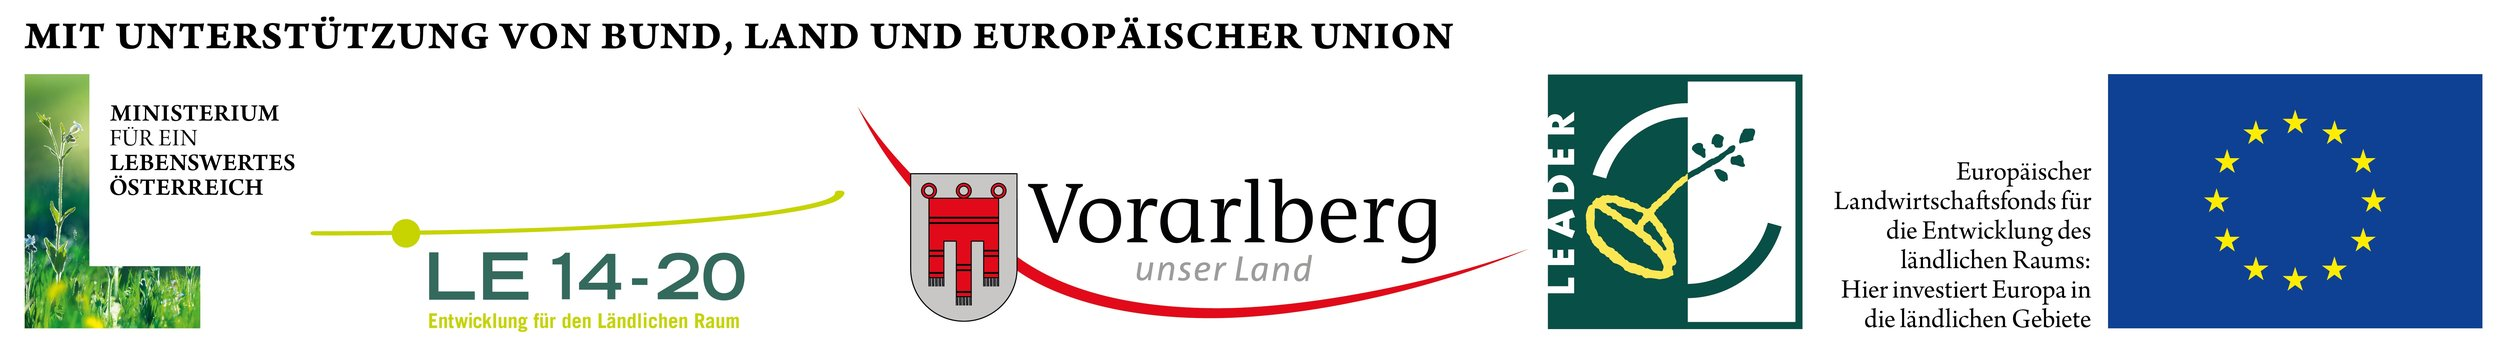 Europäische Union:  https://ec.europa.eu/agriculture/rural-development-2014-2020_de   Bund:  https://www.bmnt.gv.at/land/laendl_entwicklung.html